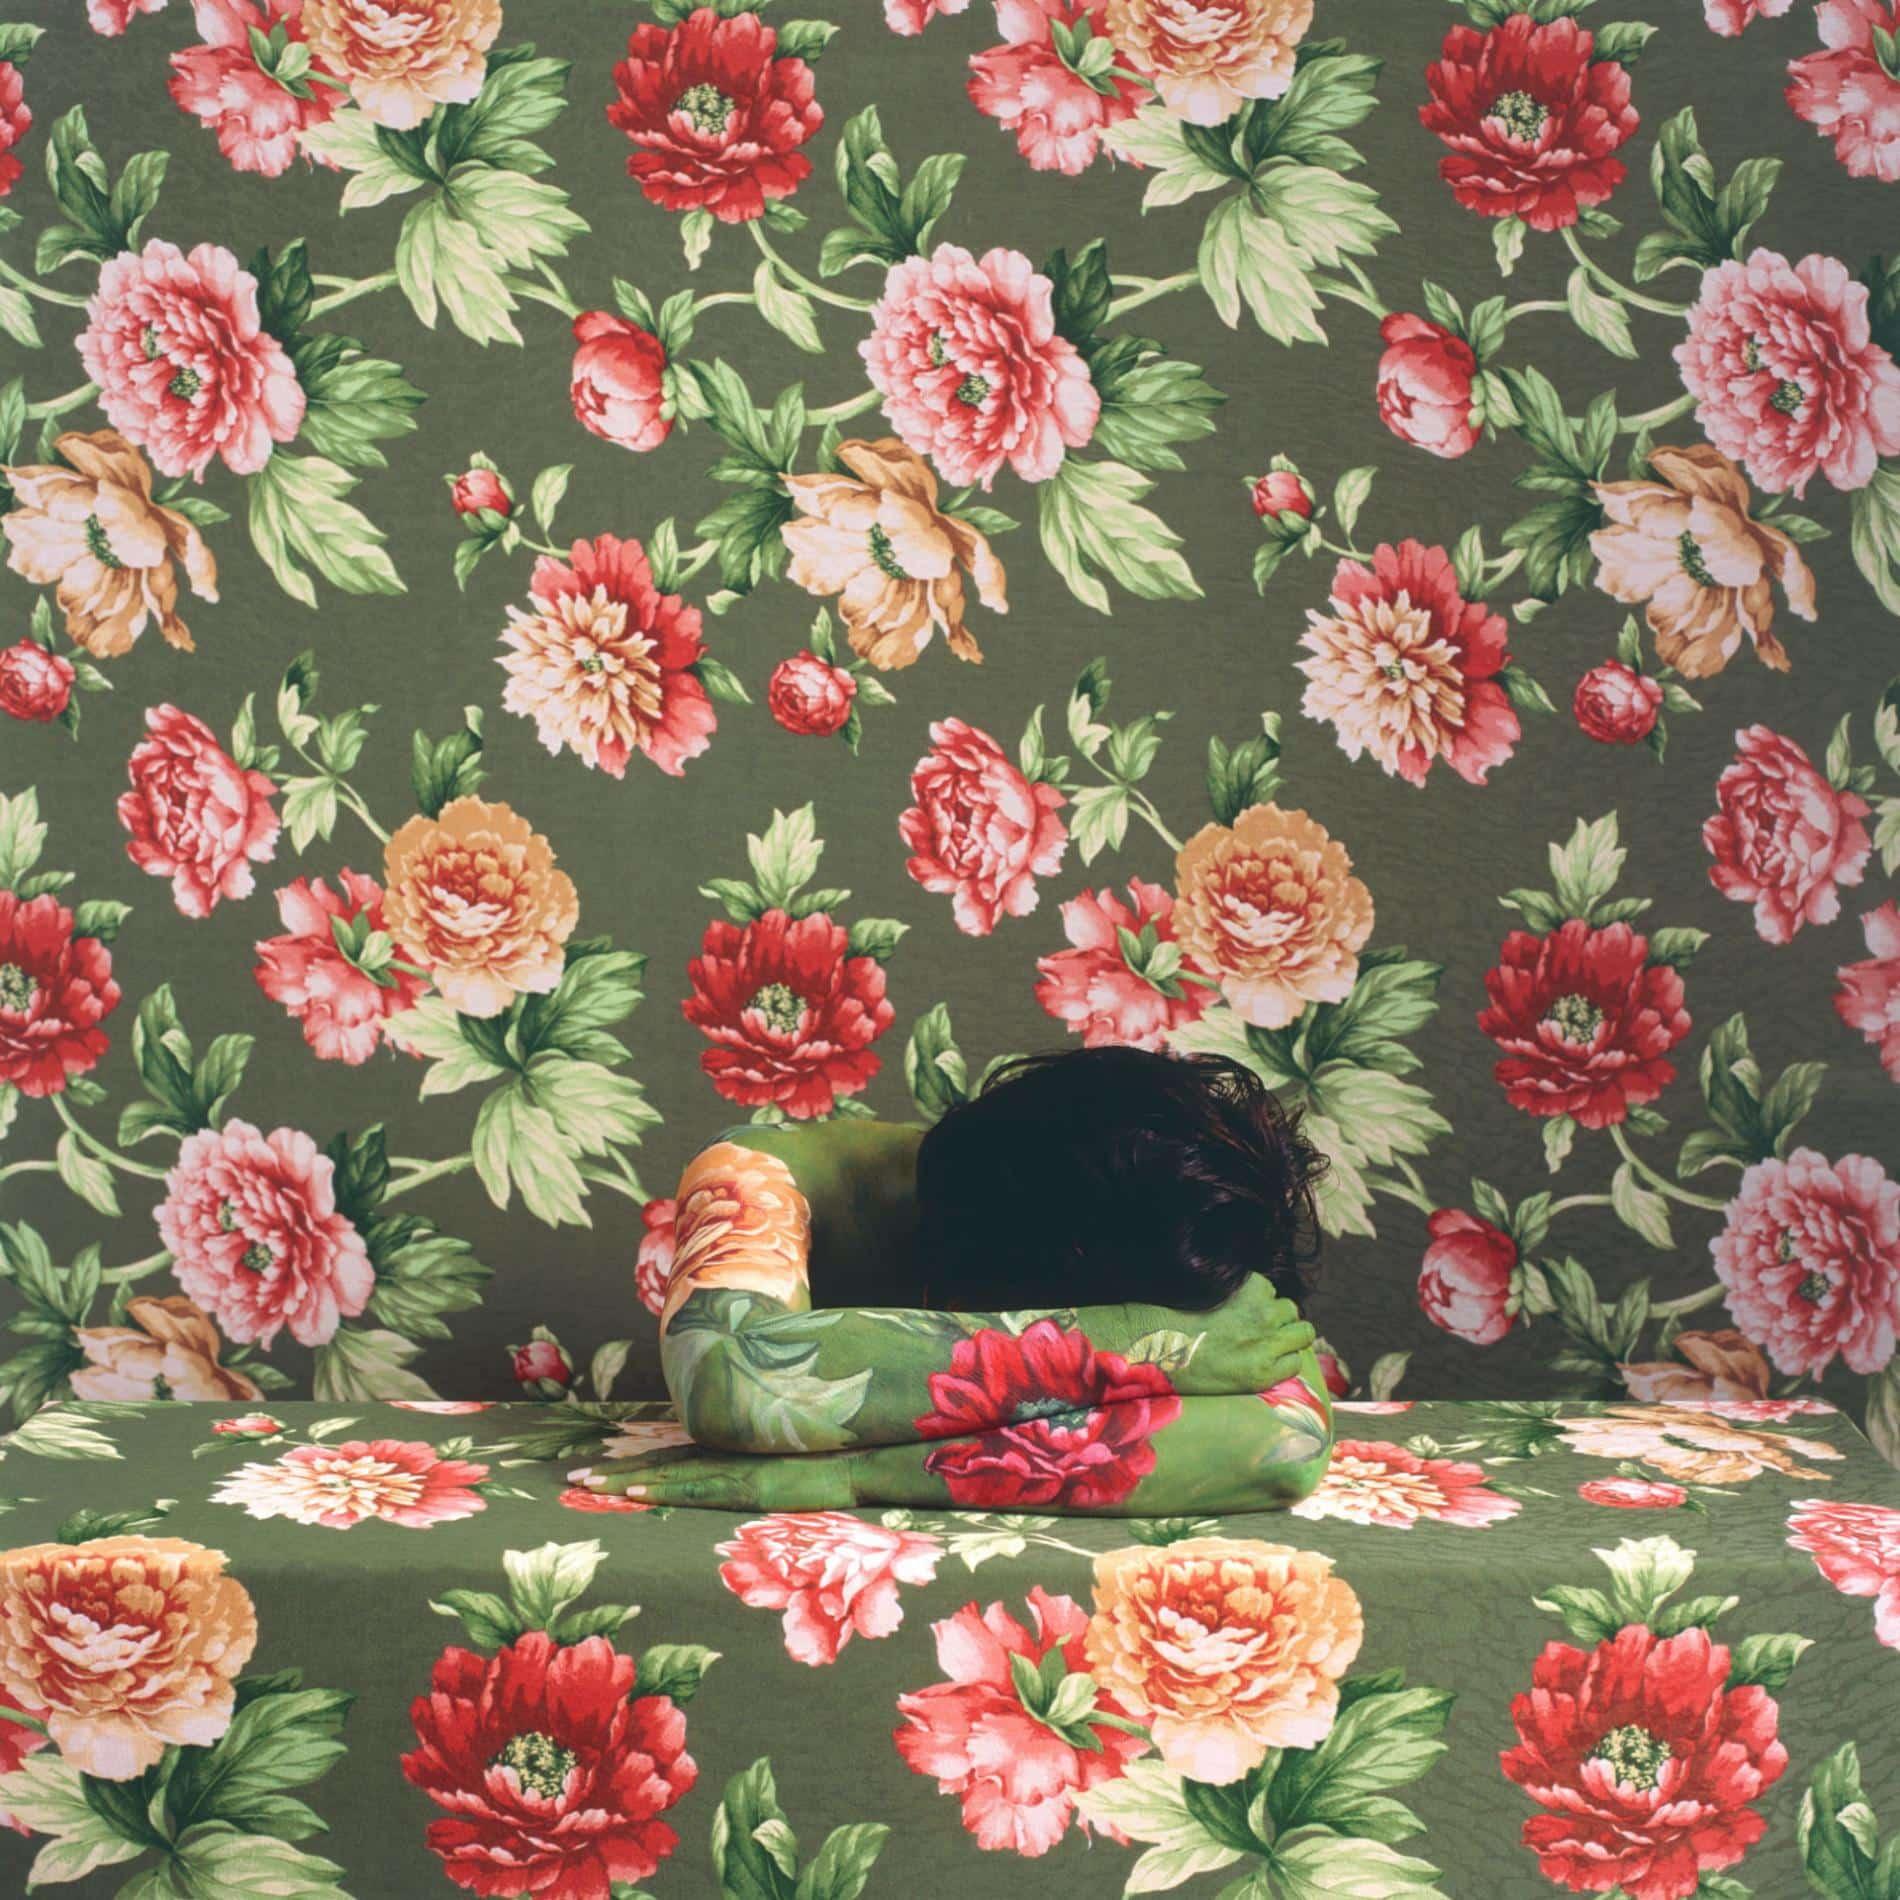 Cecilia Parades camuflaje rosas